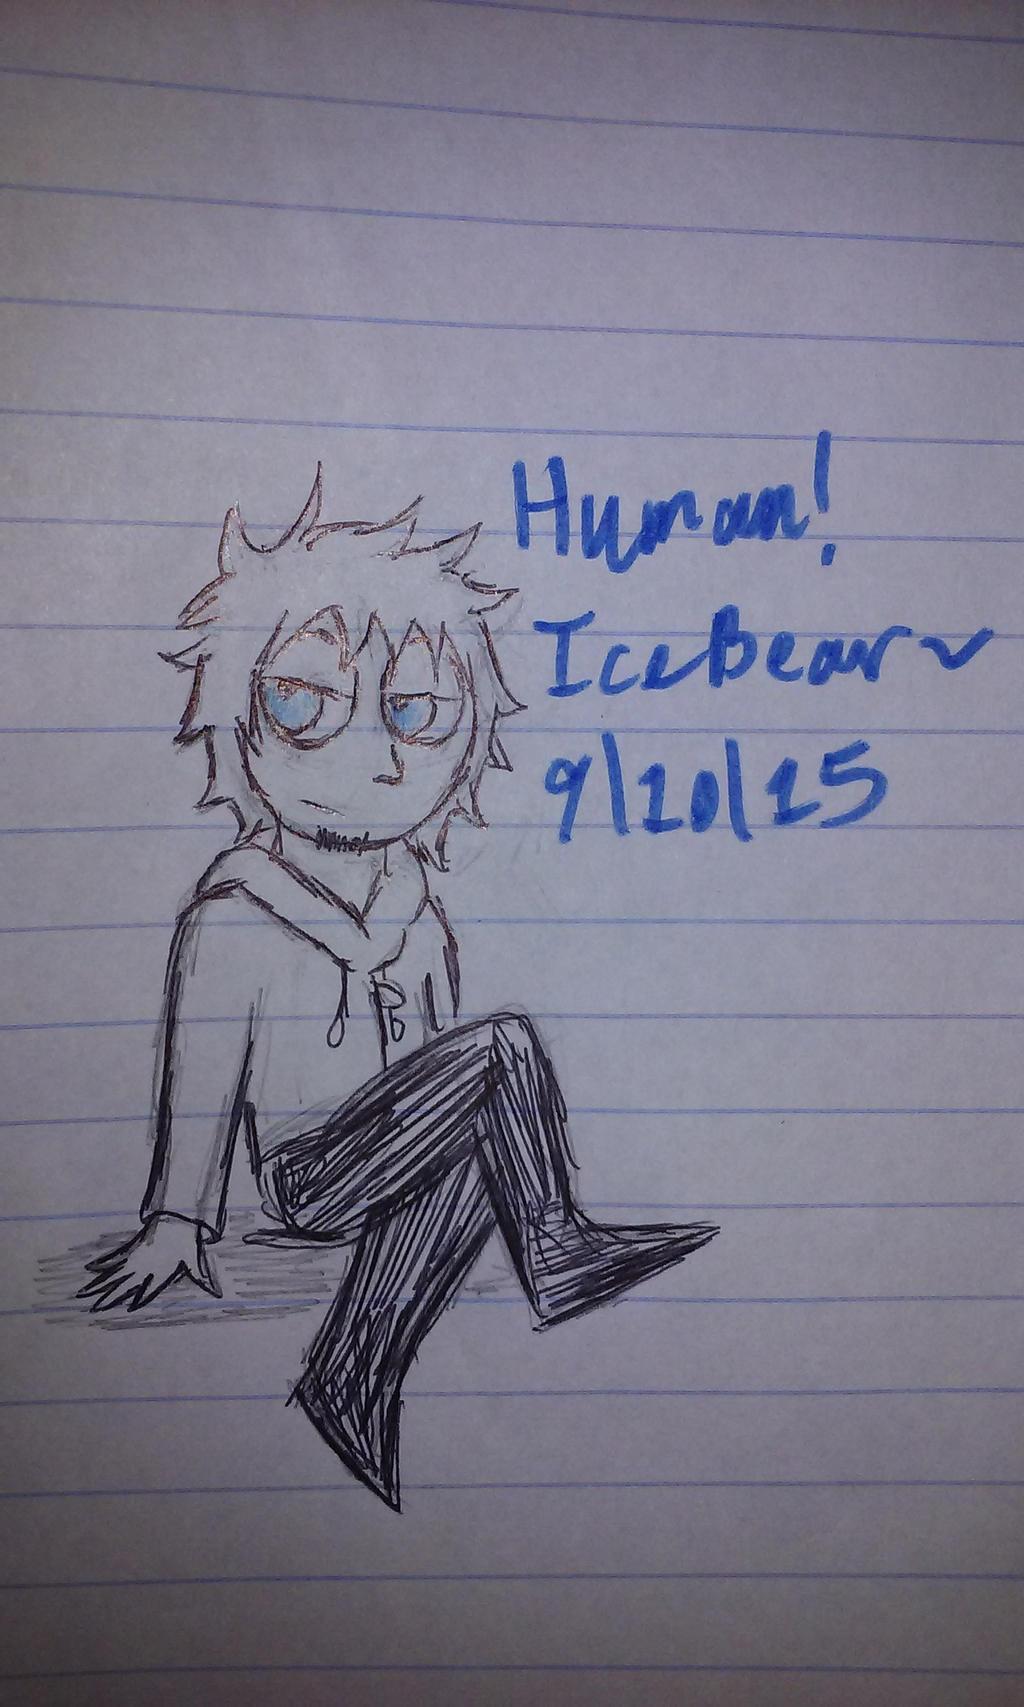 Human! Icebear by Revenir-Ghoul